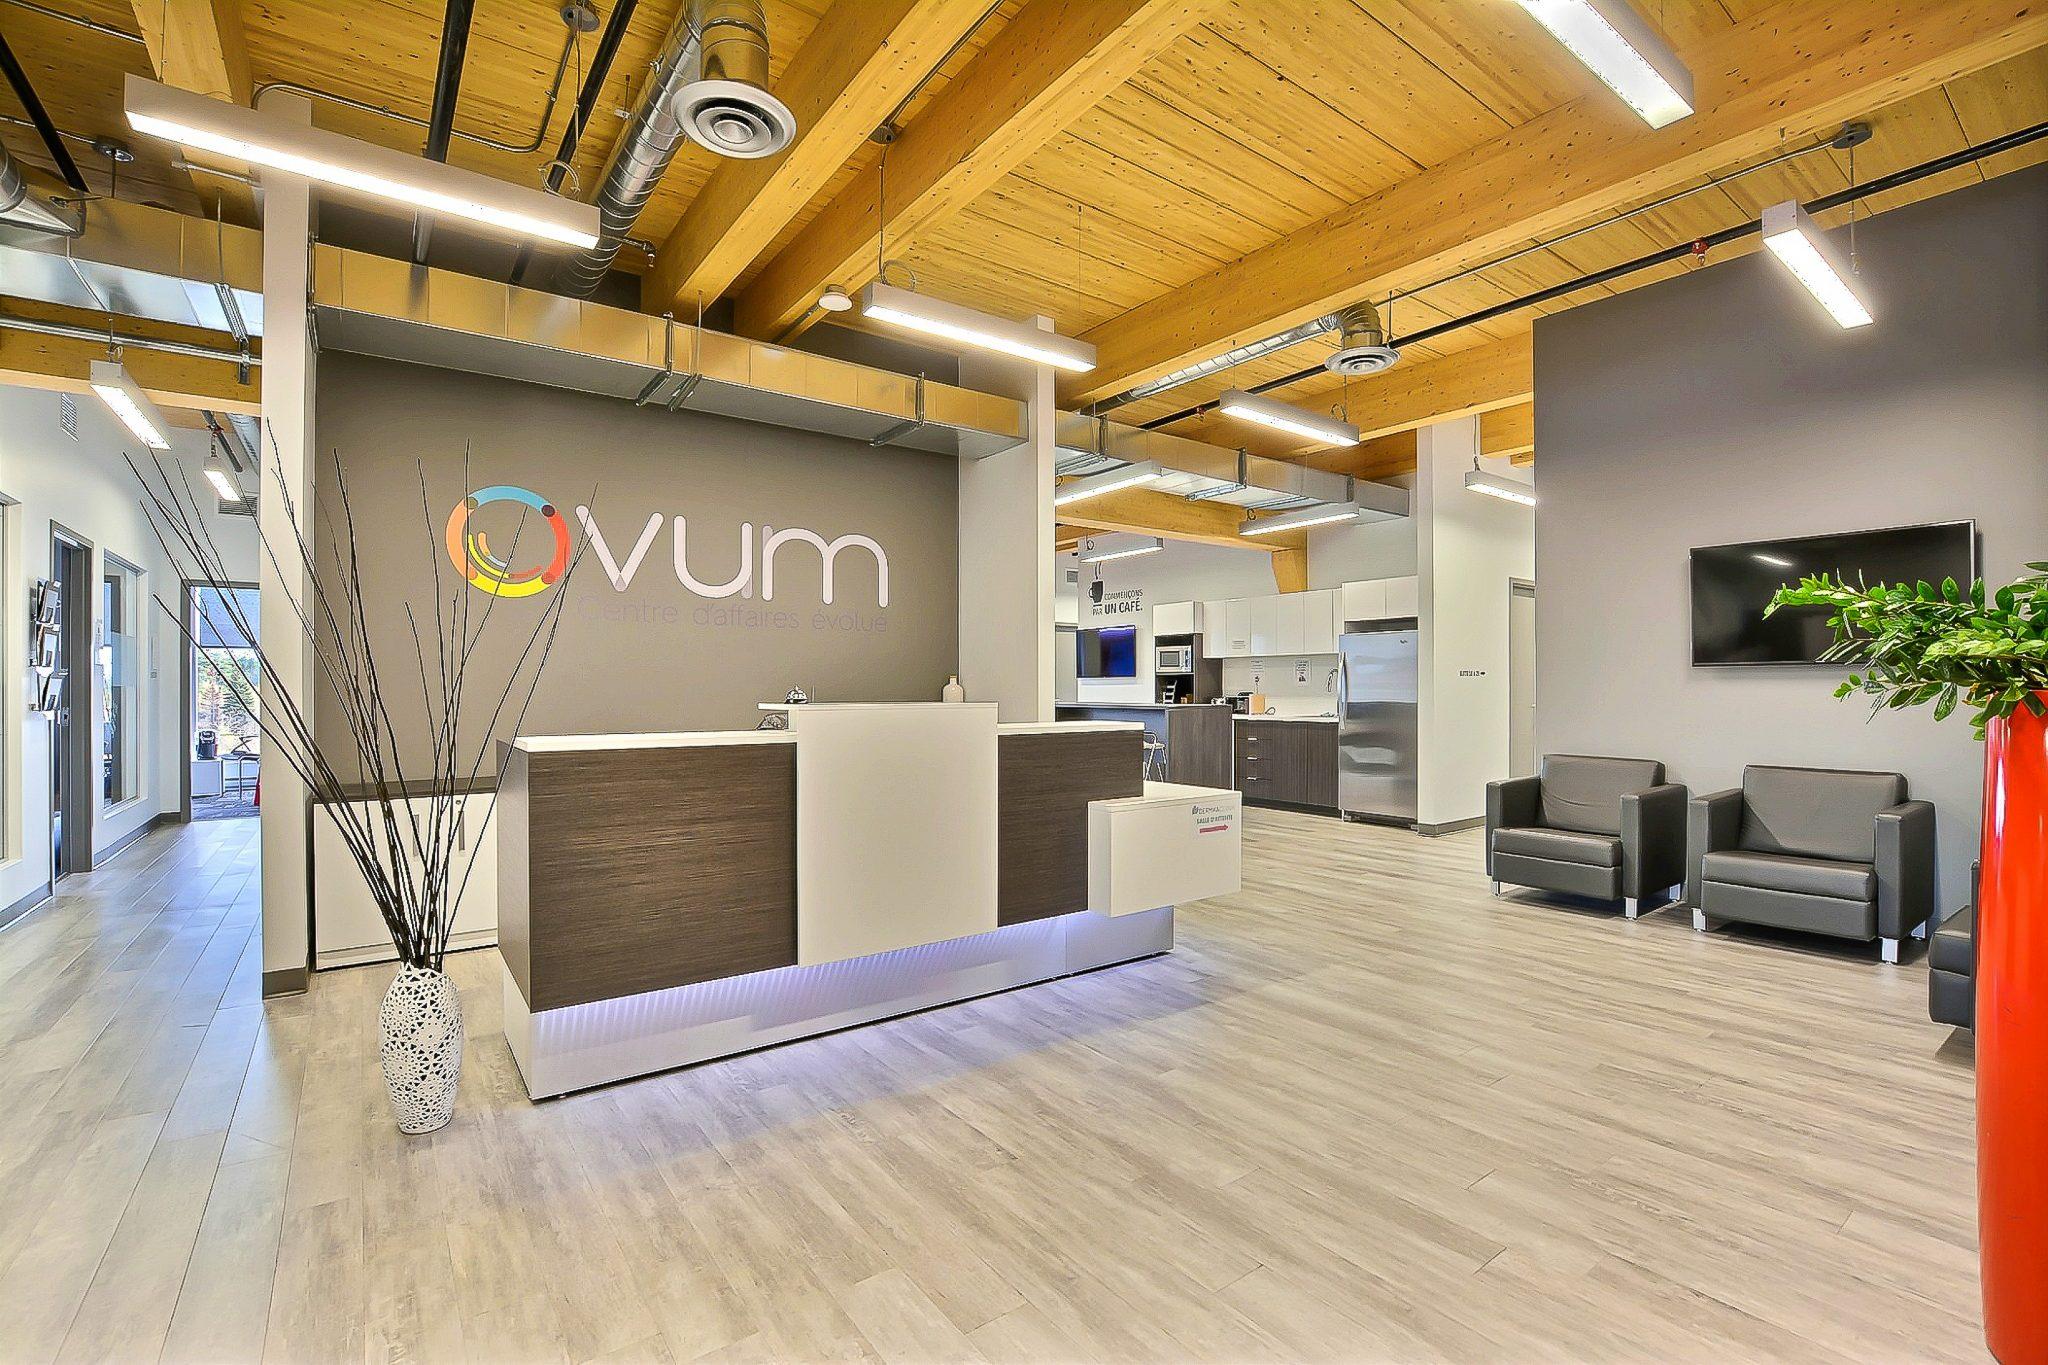 Ovum - Condos neufs a vendre à Mirabel   Skyblu Condos